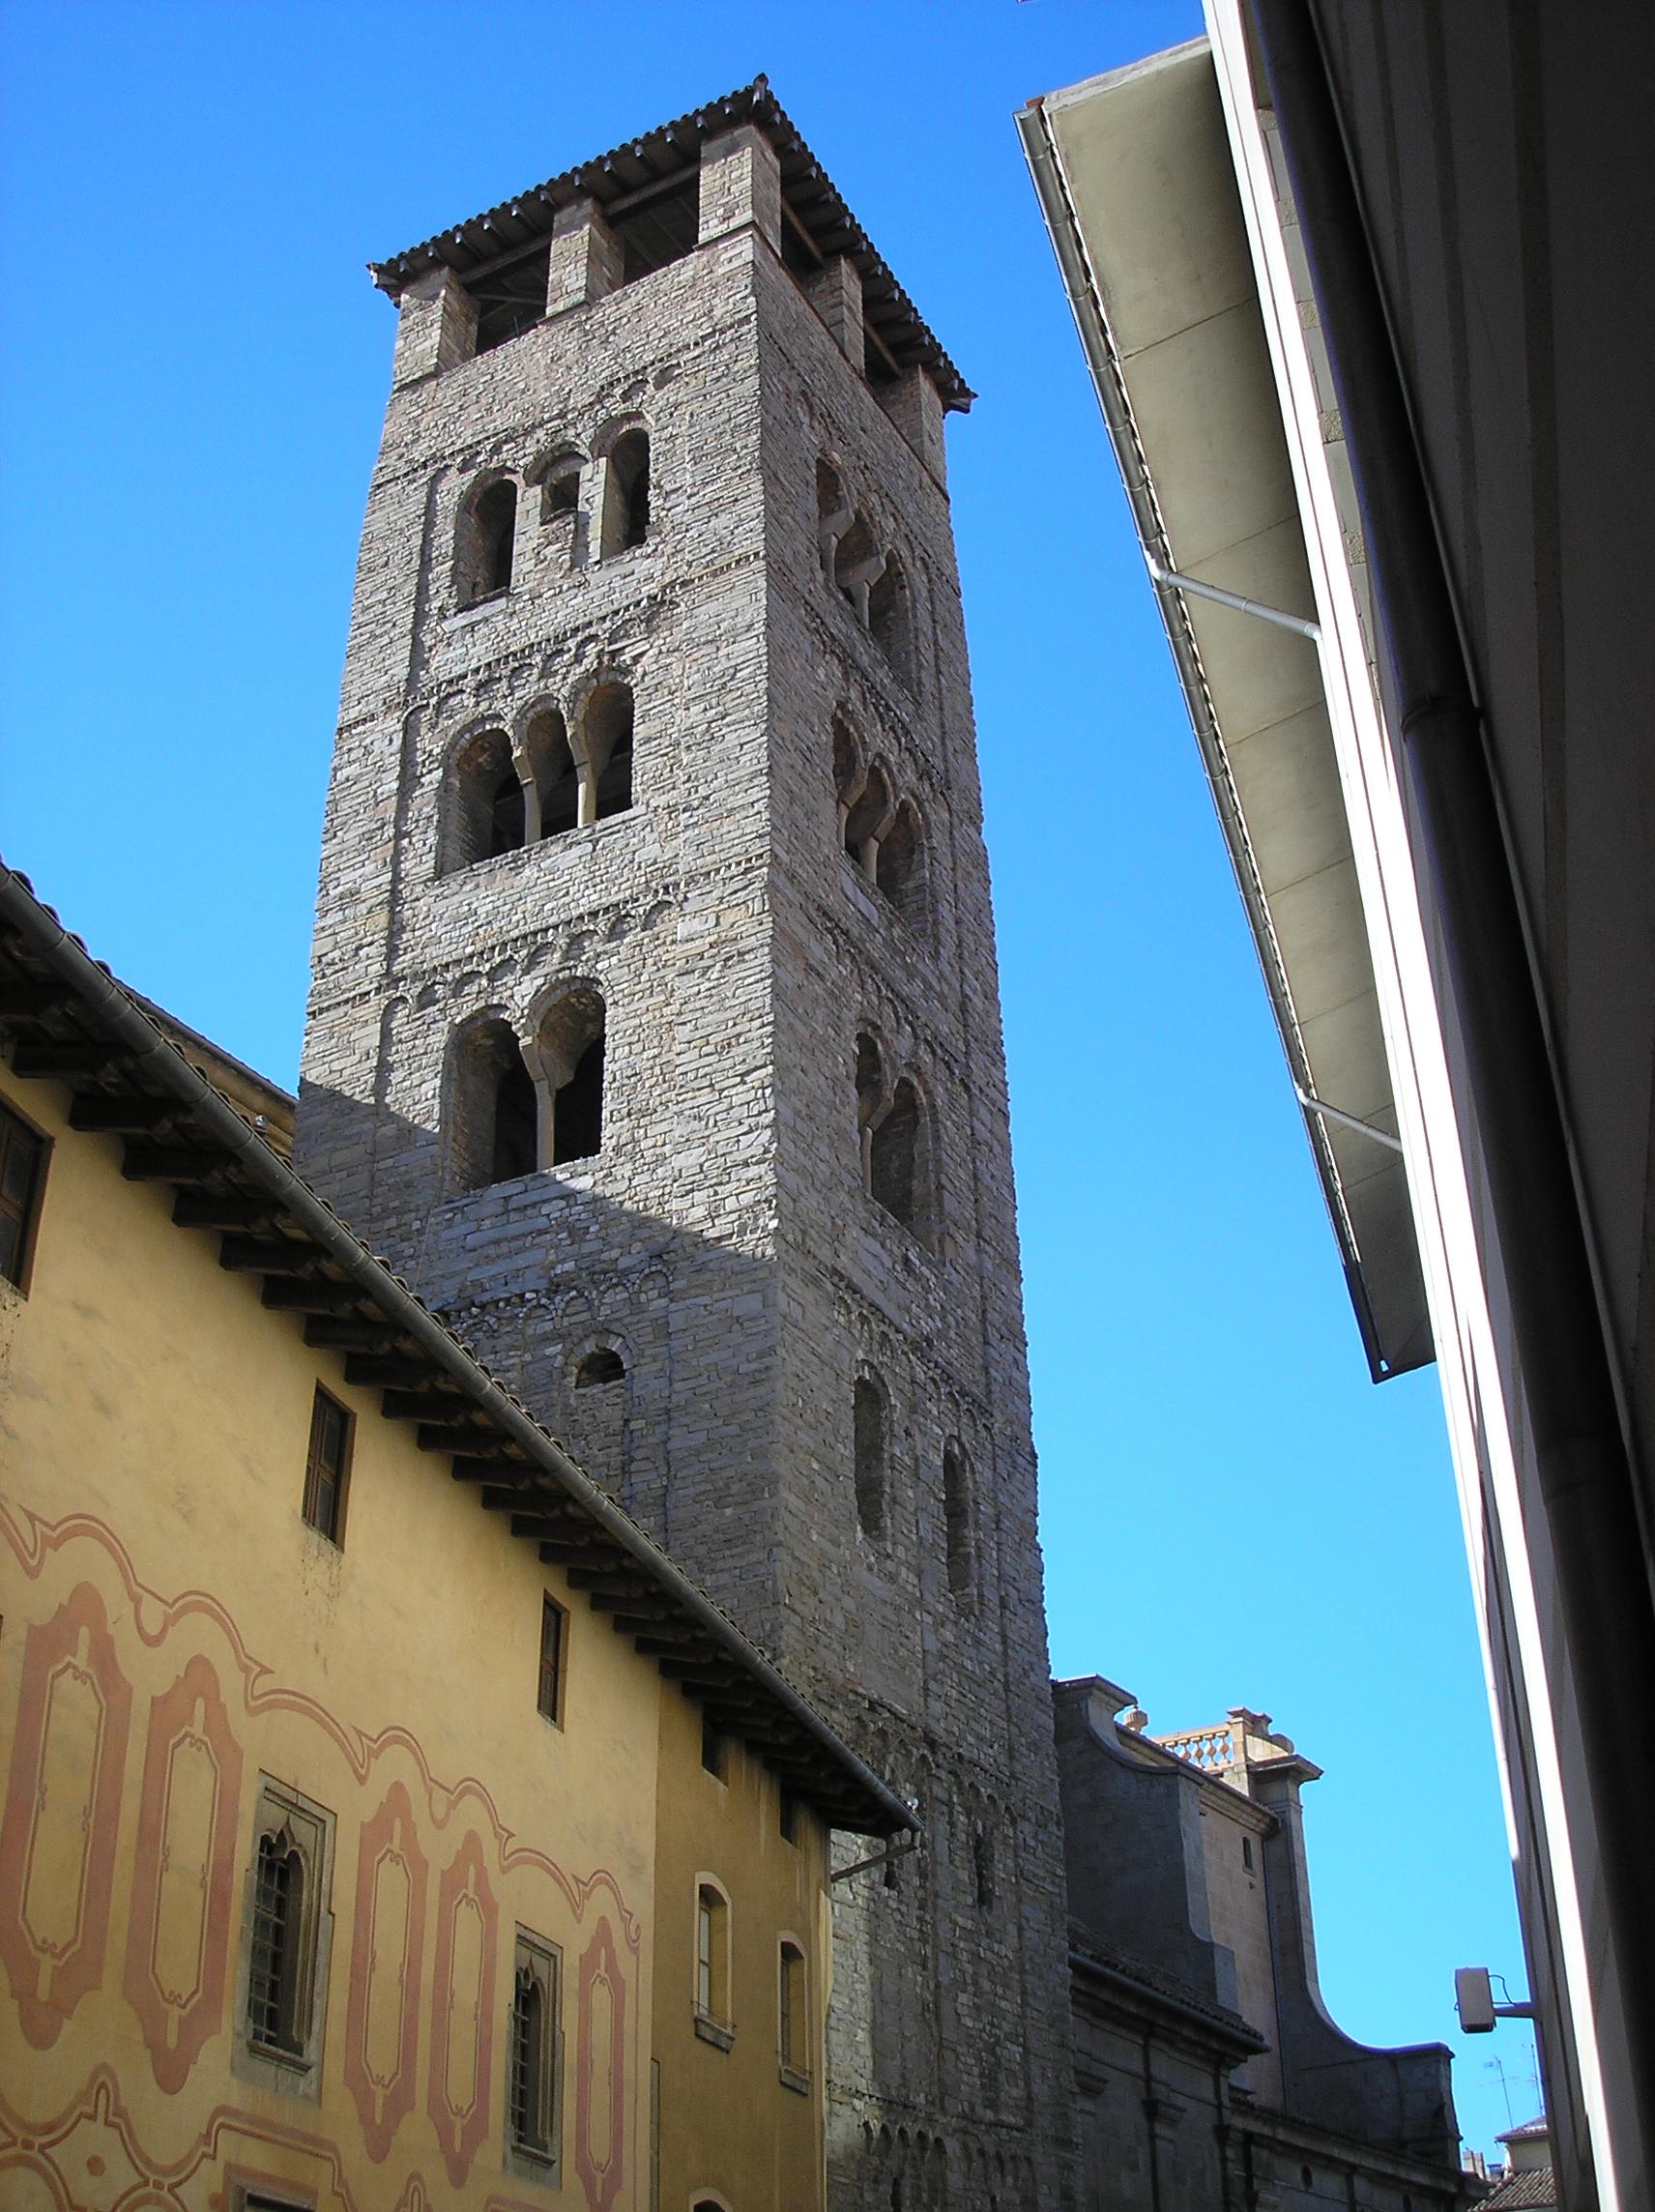 File:Catedral de Sant Pere. Vic.jpg - Wikimedia Commons